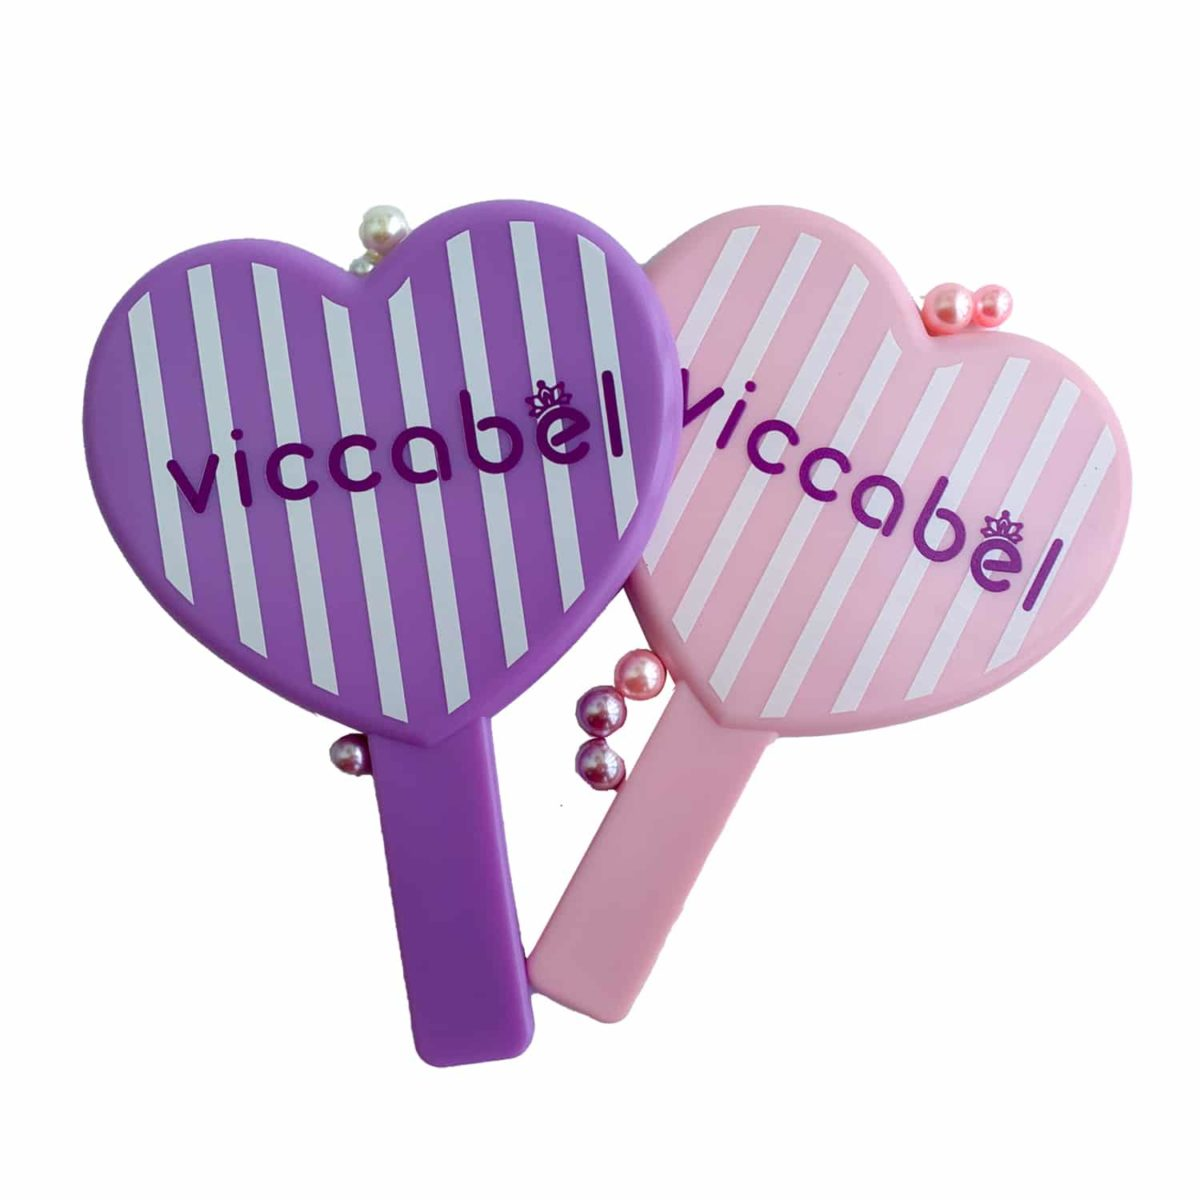 viccabelmirror2